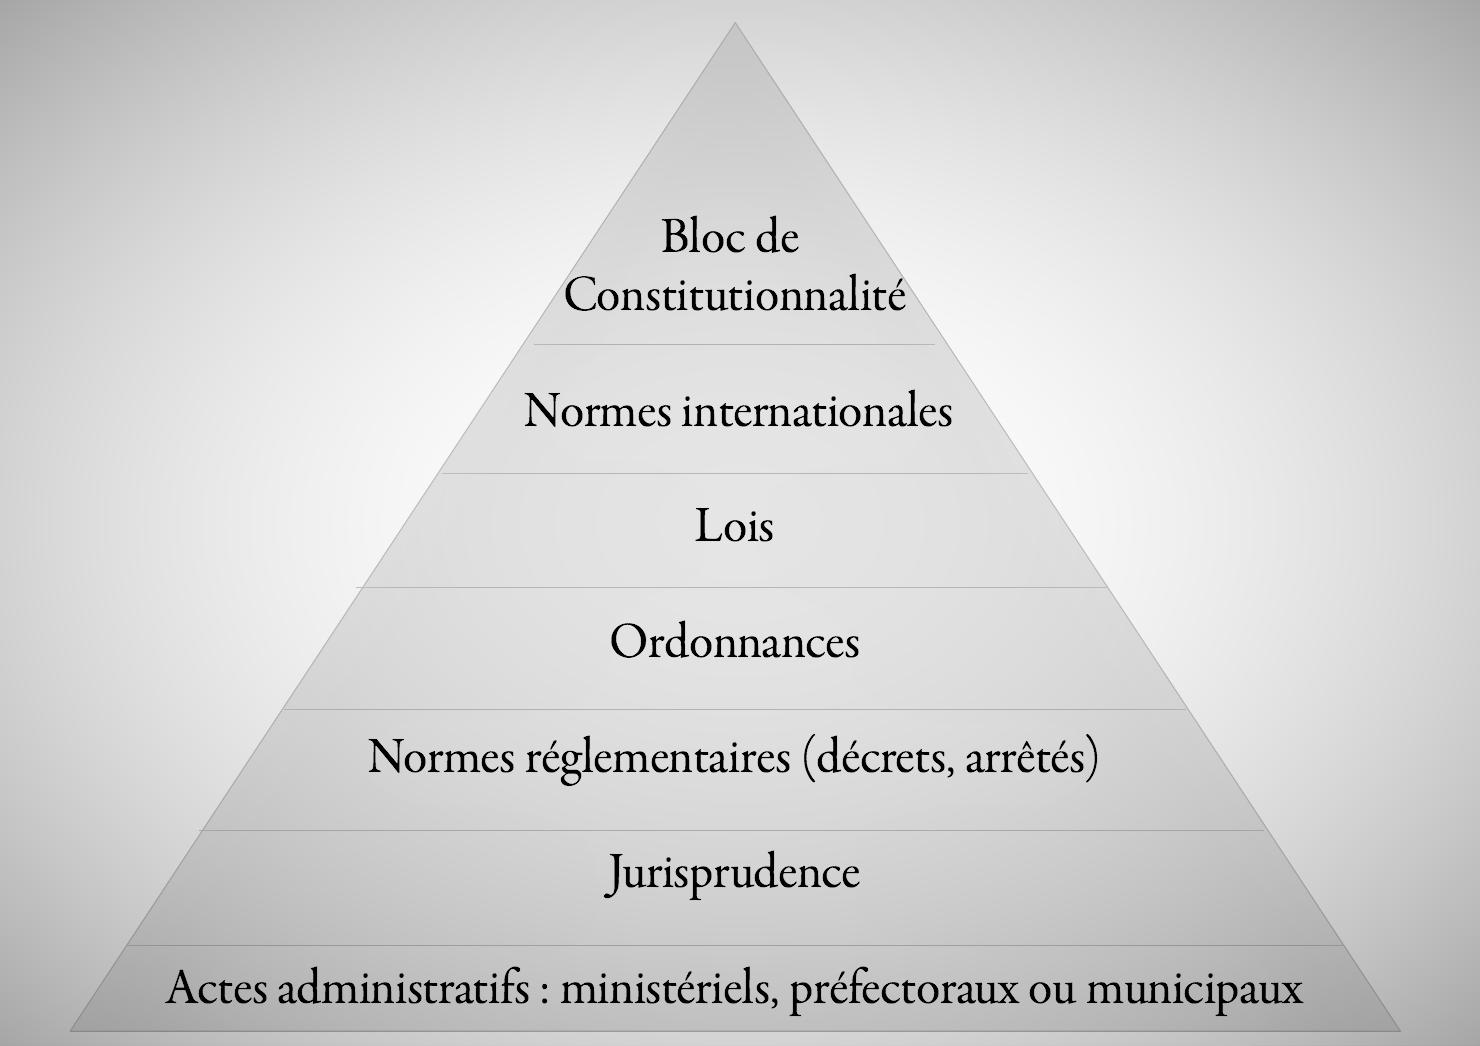 definition-def-juridique-jurisprudence-hierarchie-des-normes-pyramide